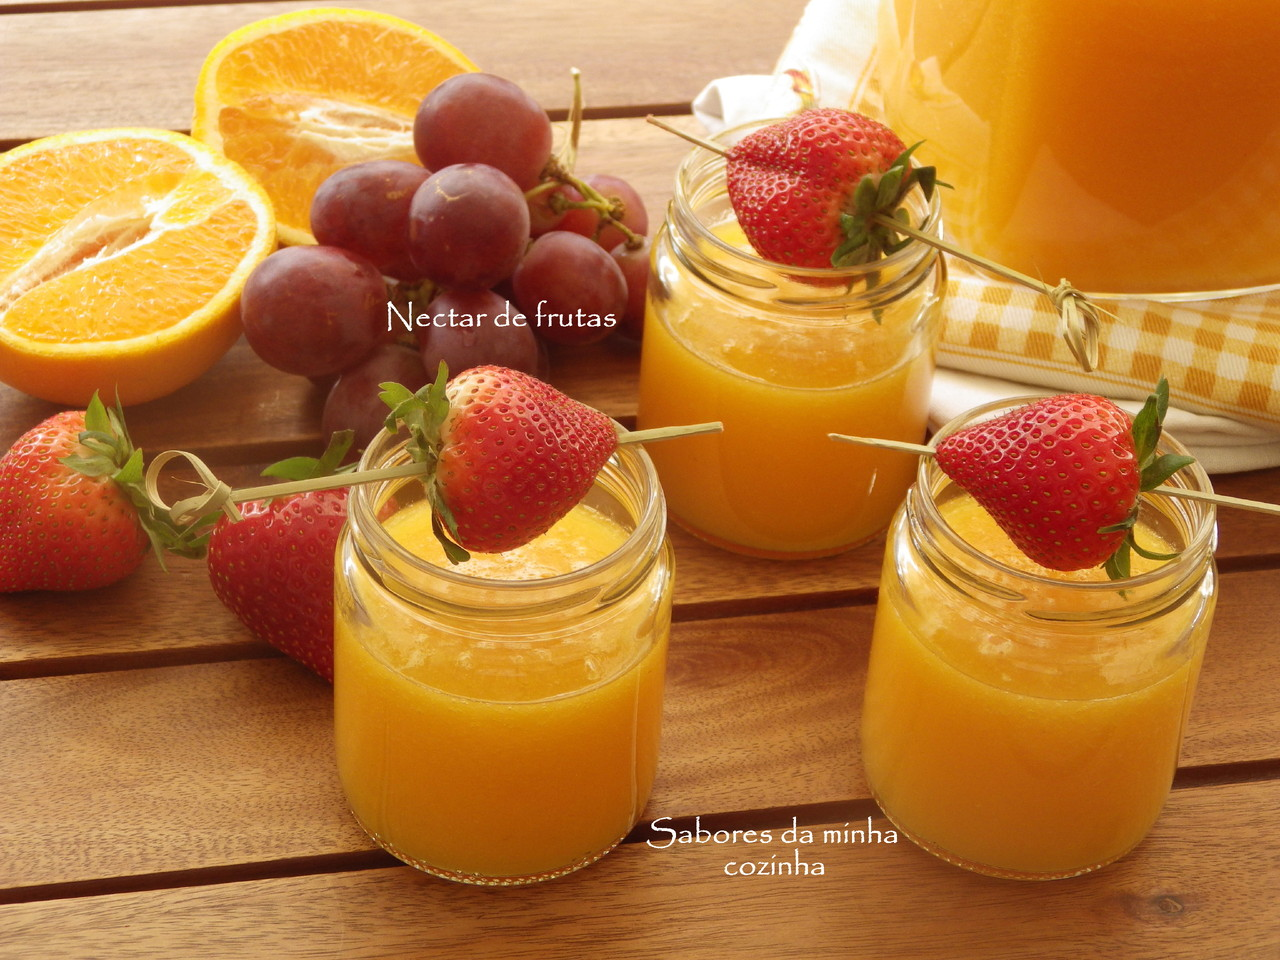 IMGP4763-Nectar de frutas-Blog.JPG